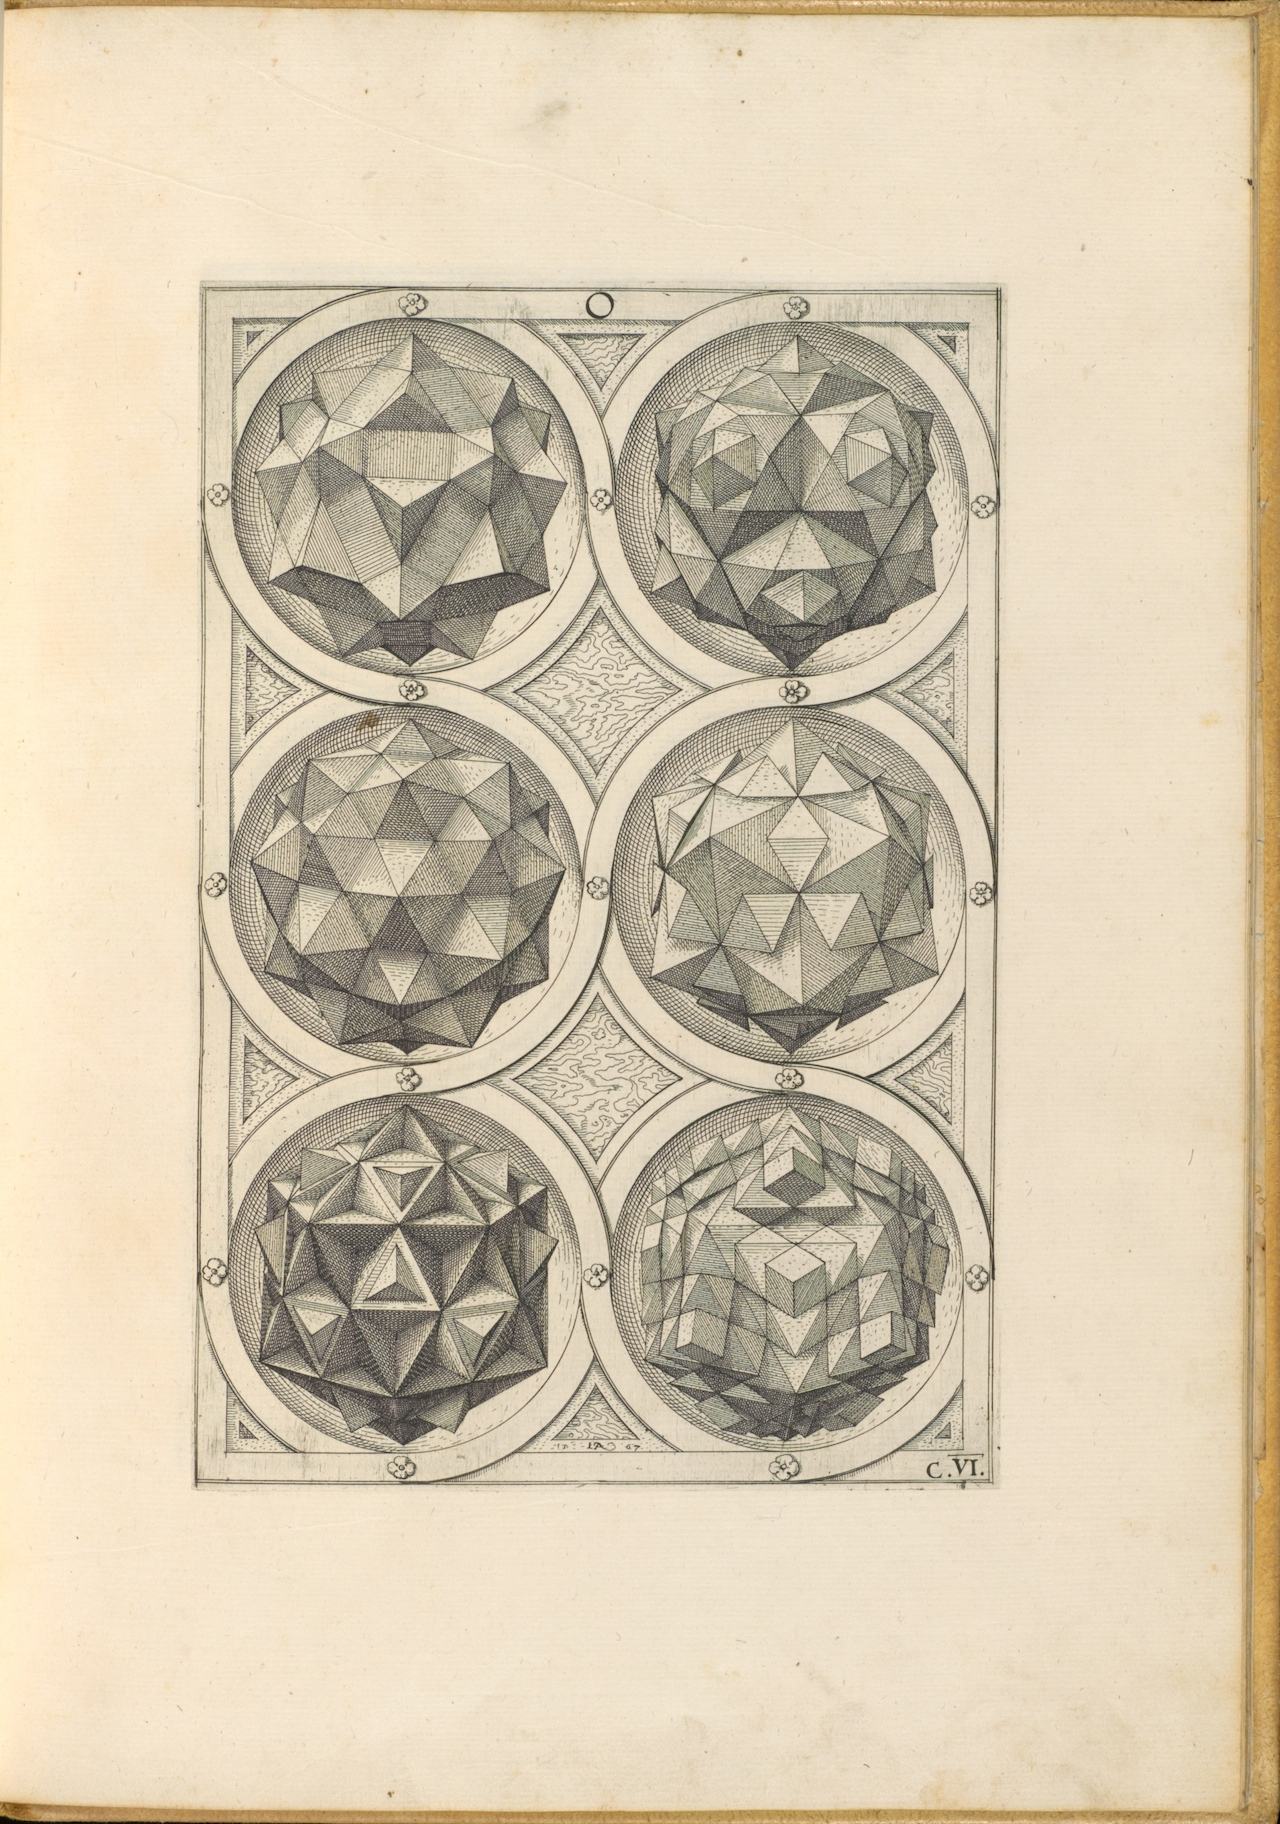 renaissance-era-geometry-book-8